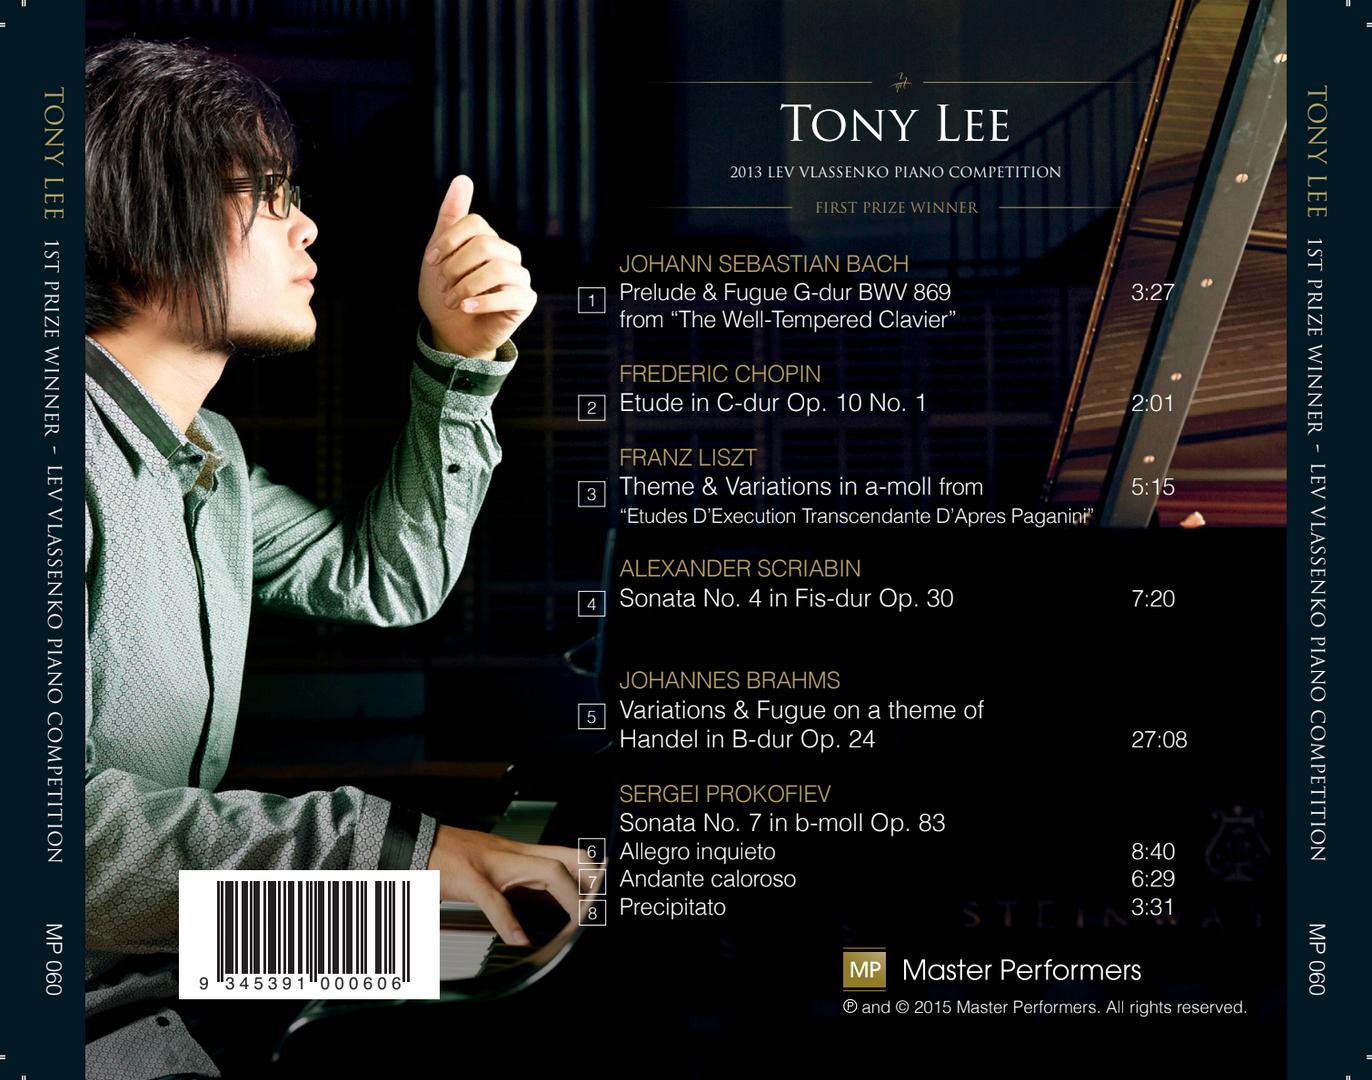 Tony Lee 2013 Lev Vlassenko Piano Competition CD Tray